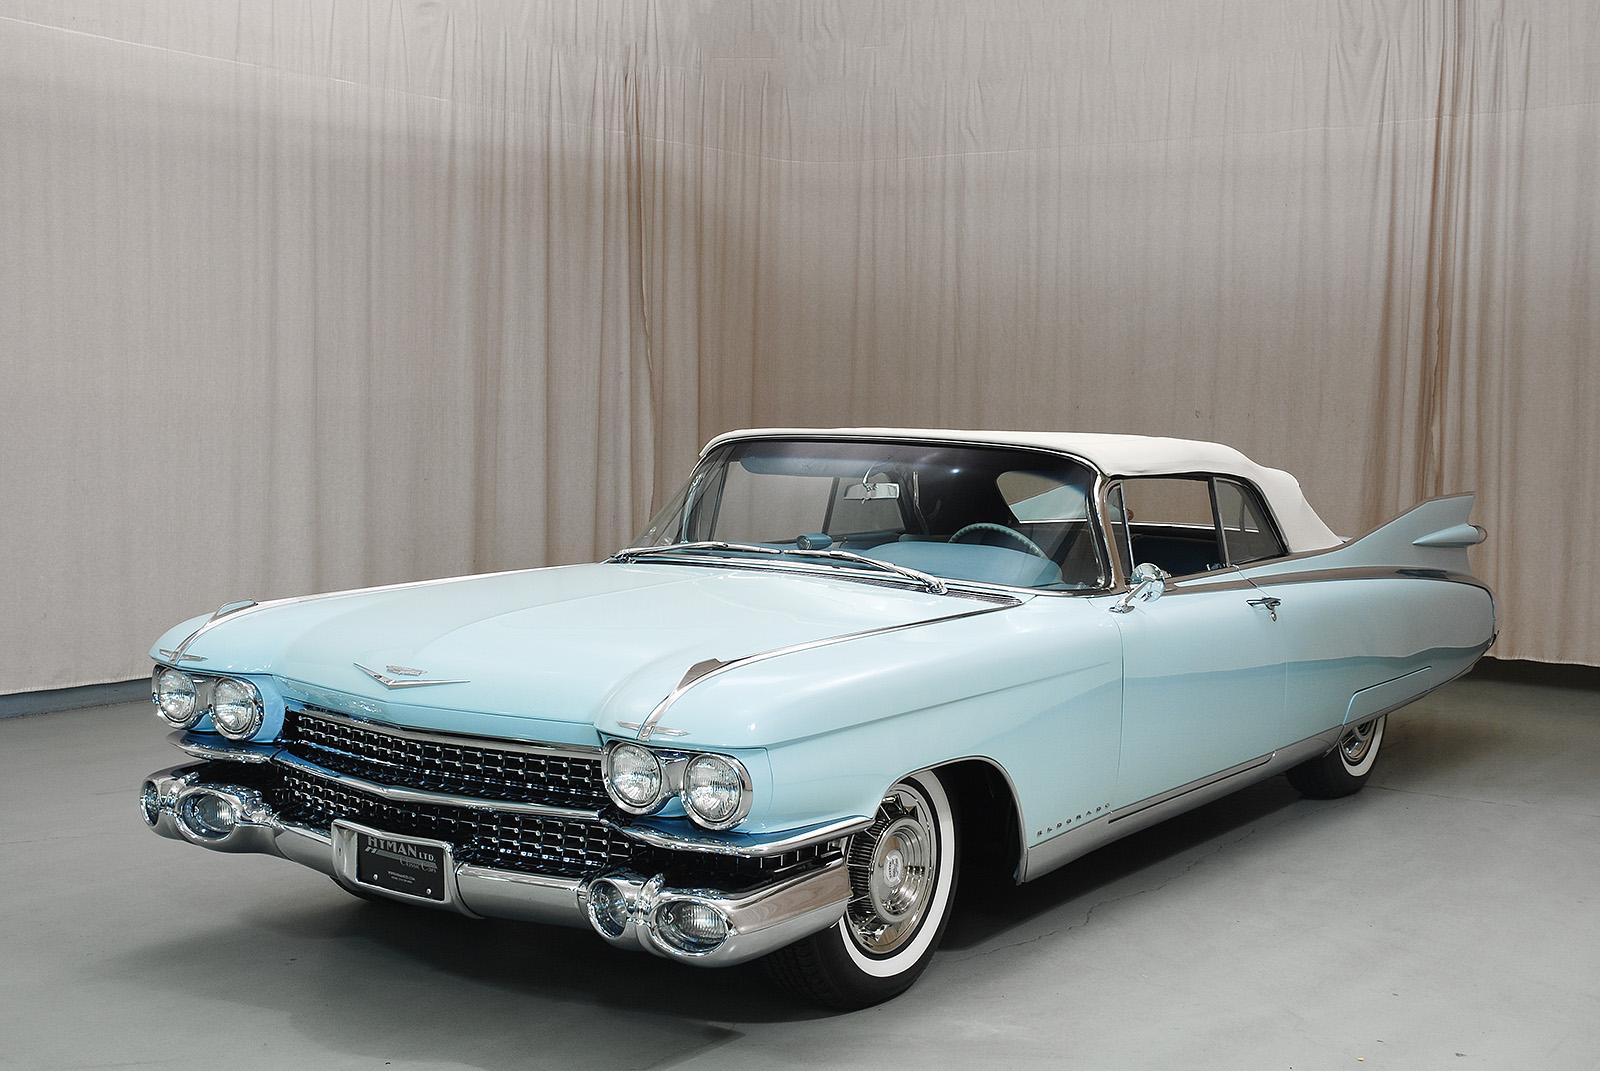 Cadillac Eldorado 2015 >> 1959 Cadillac Eldorado Biarritz Convertible | Hyman Ltd. Classic Cars